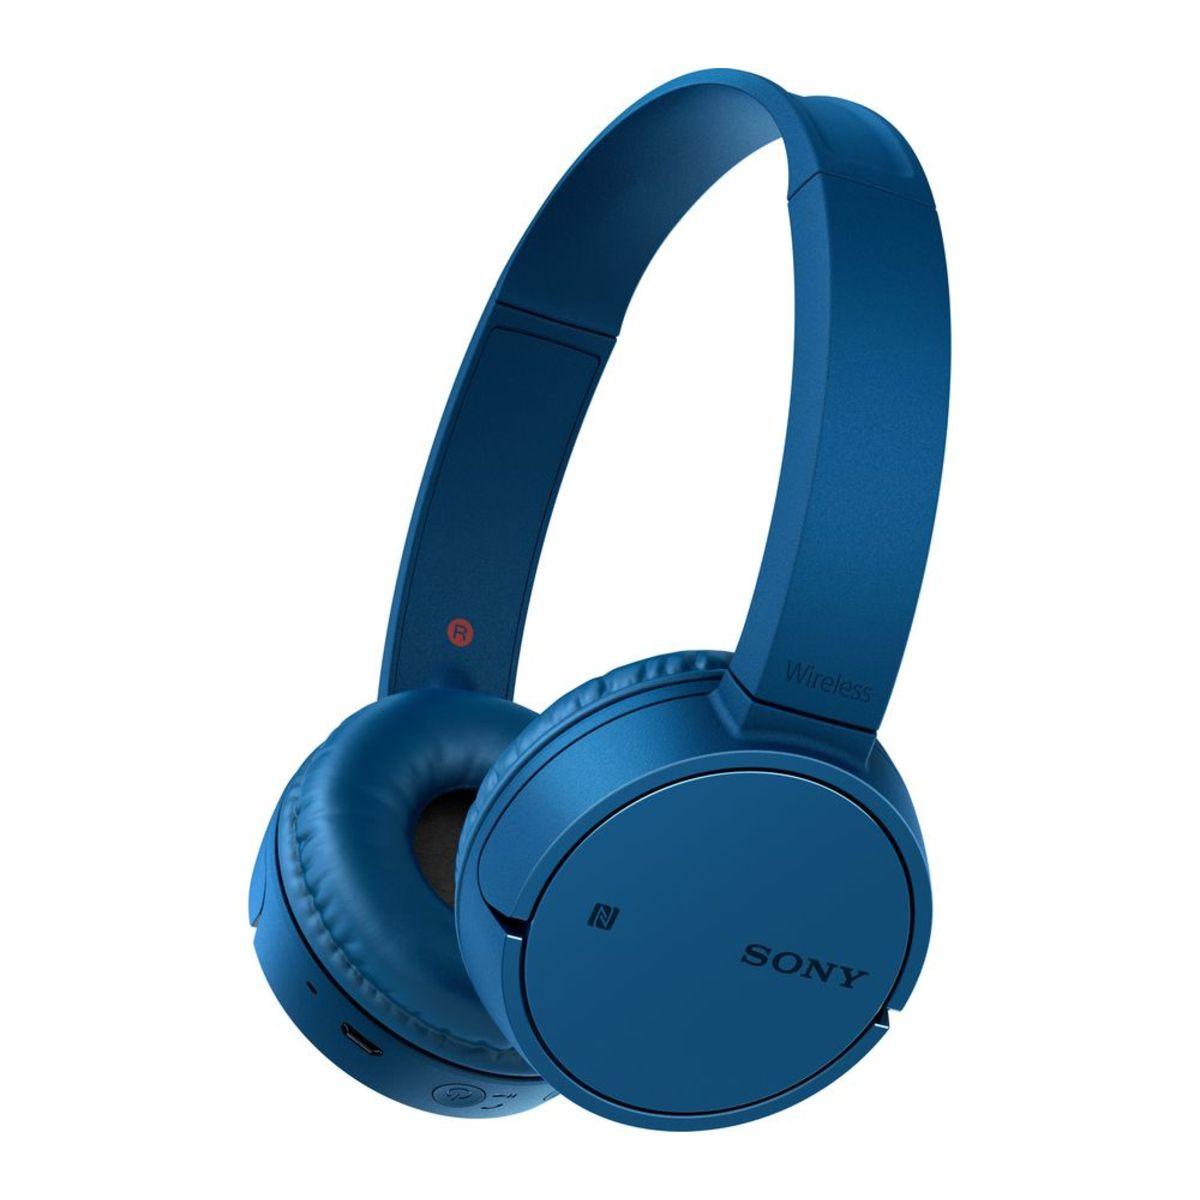 SONY WH CH500 - Casque audio - Bleu